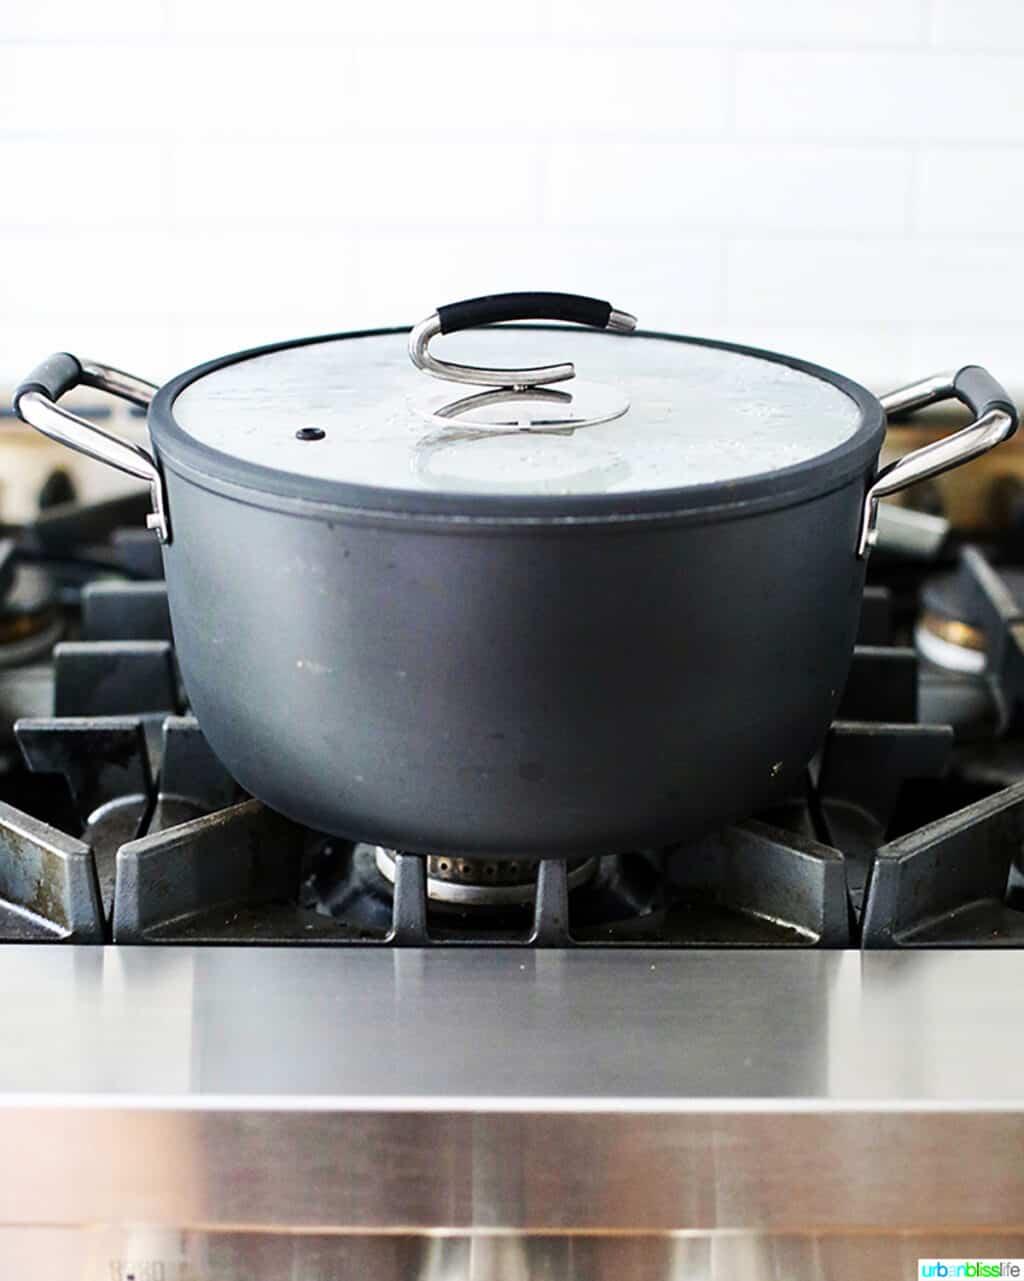 DaTerra Cucina 8Quart stockpot